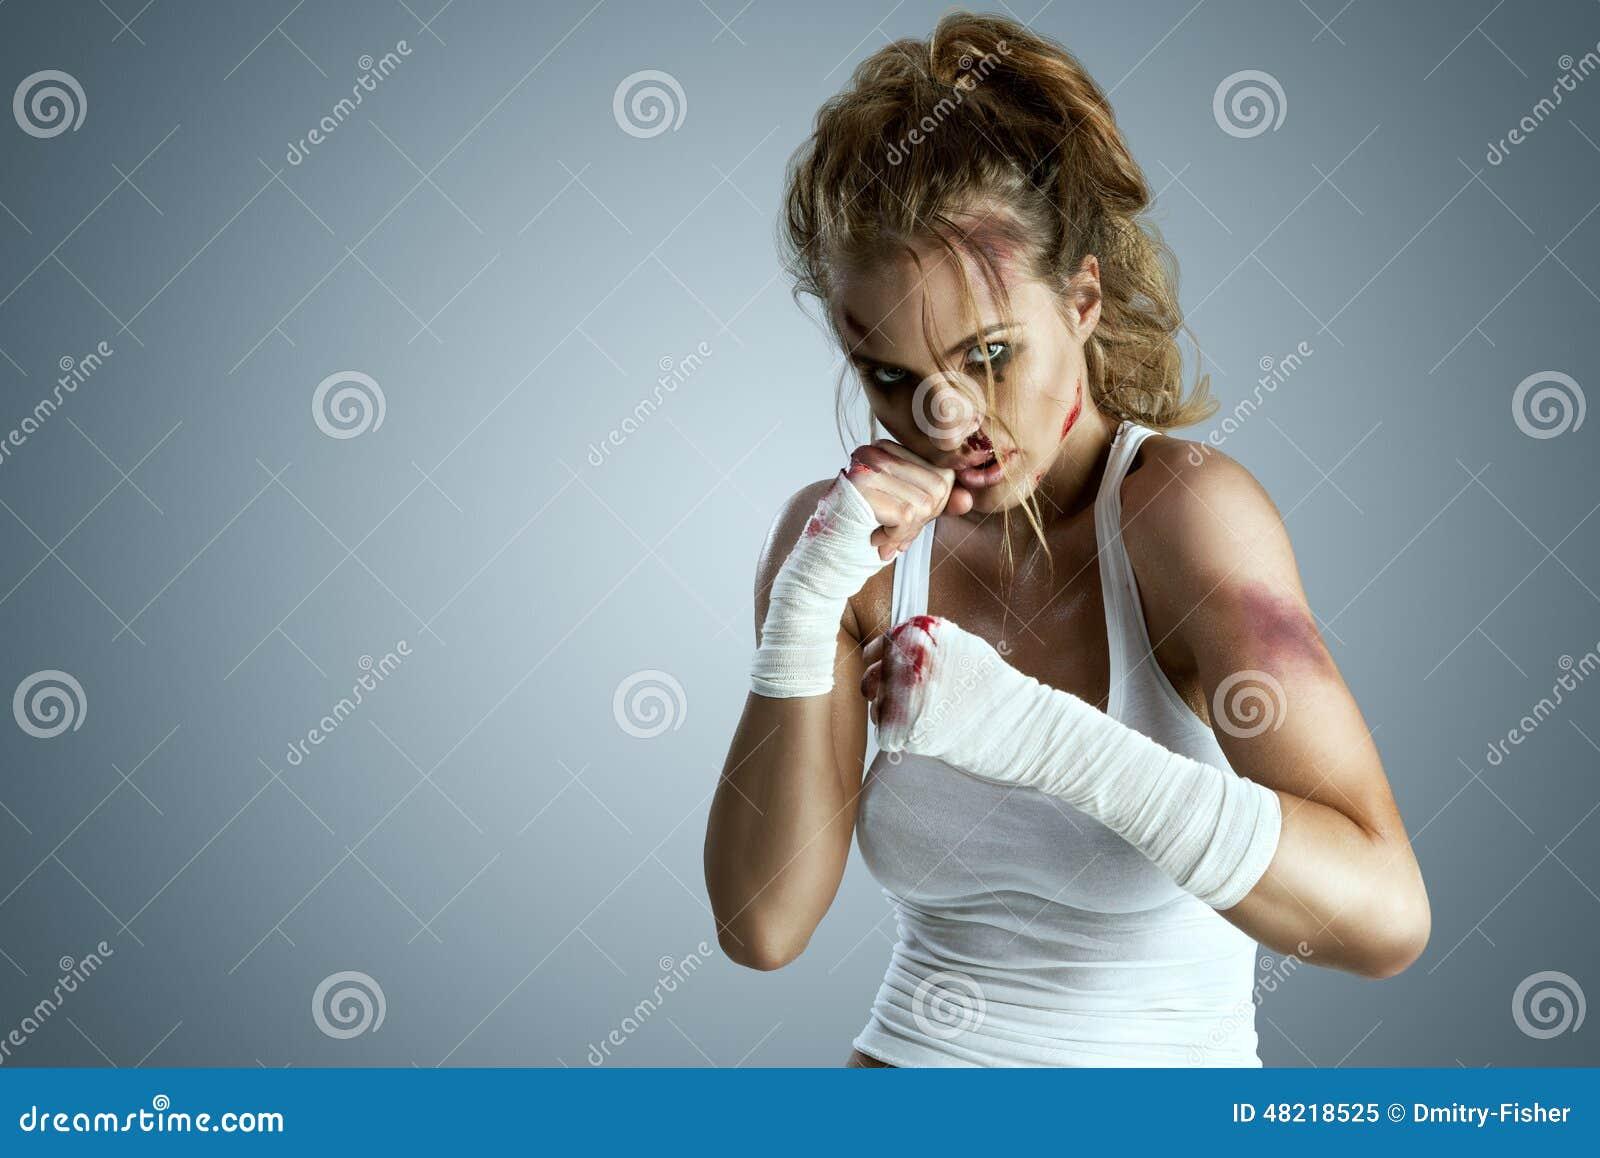 Female street fighting